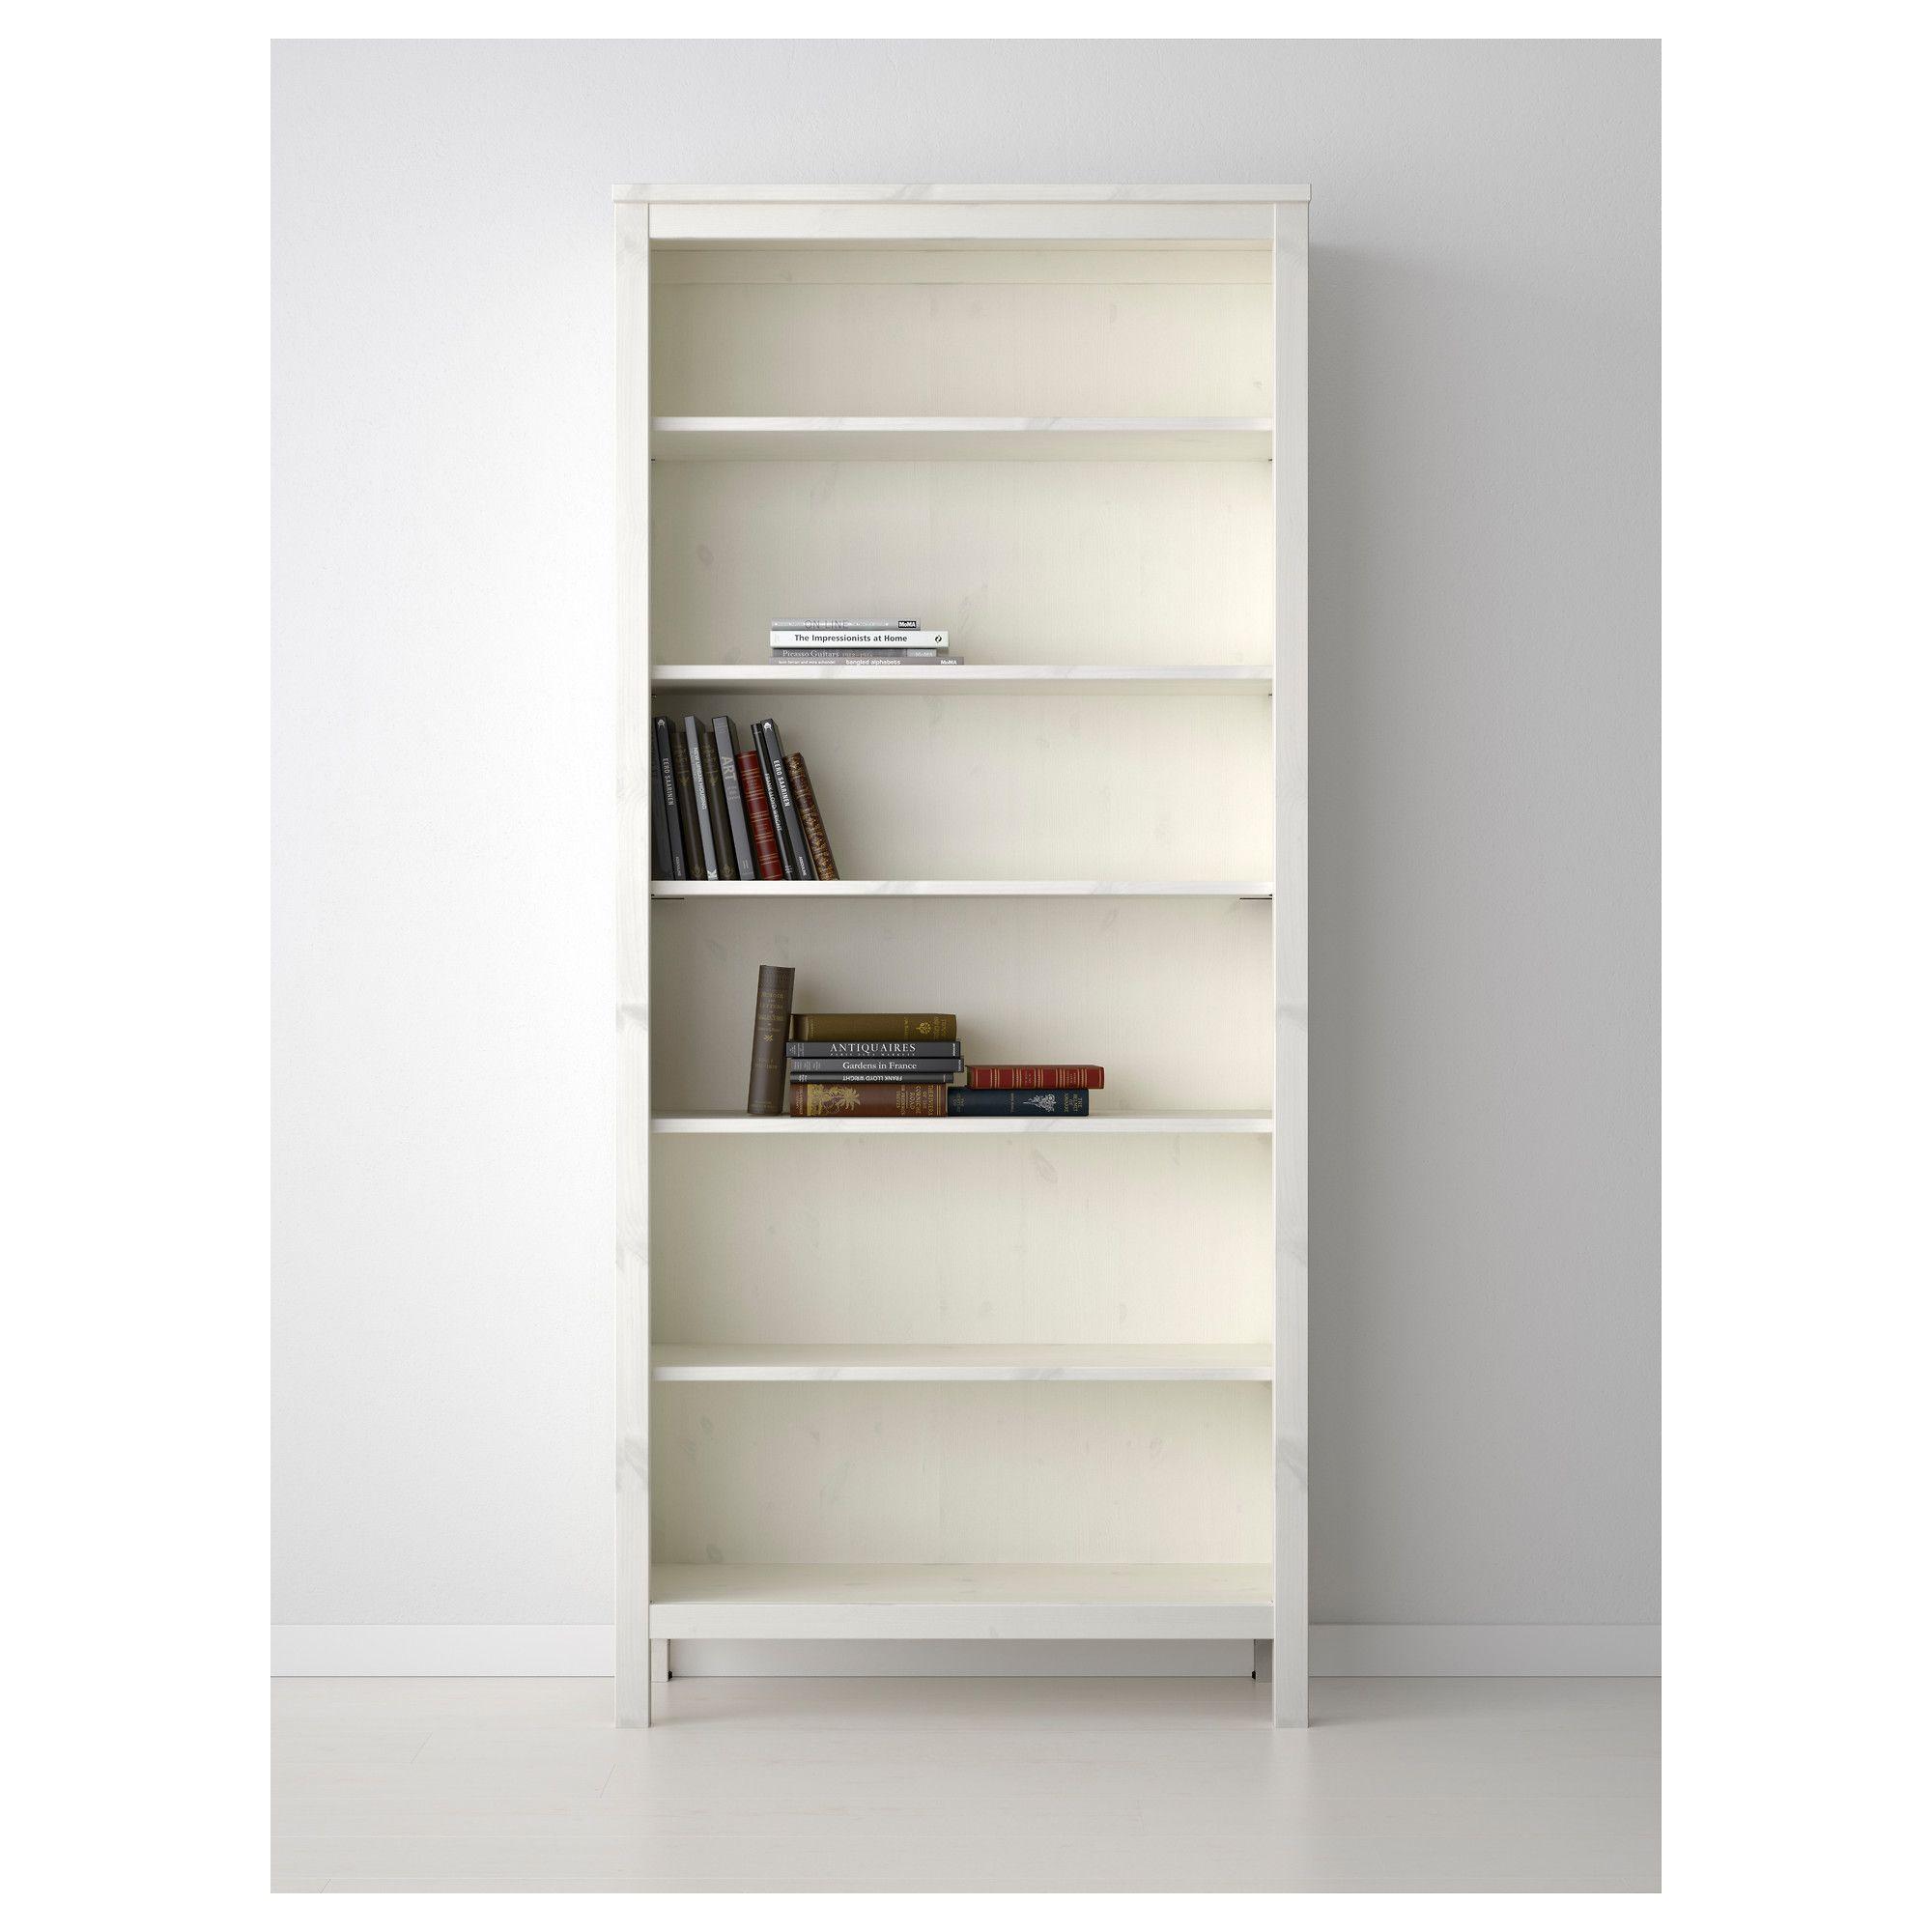 IKEA bookshelf white - Google Search